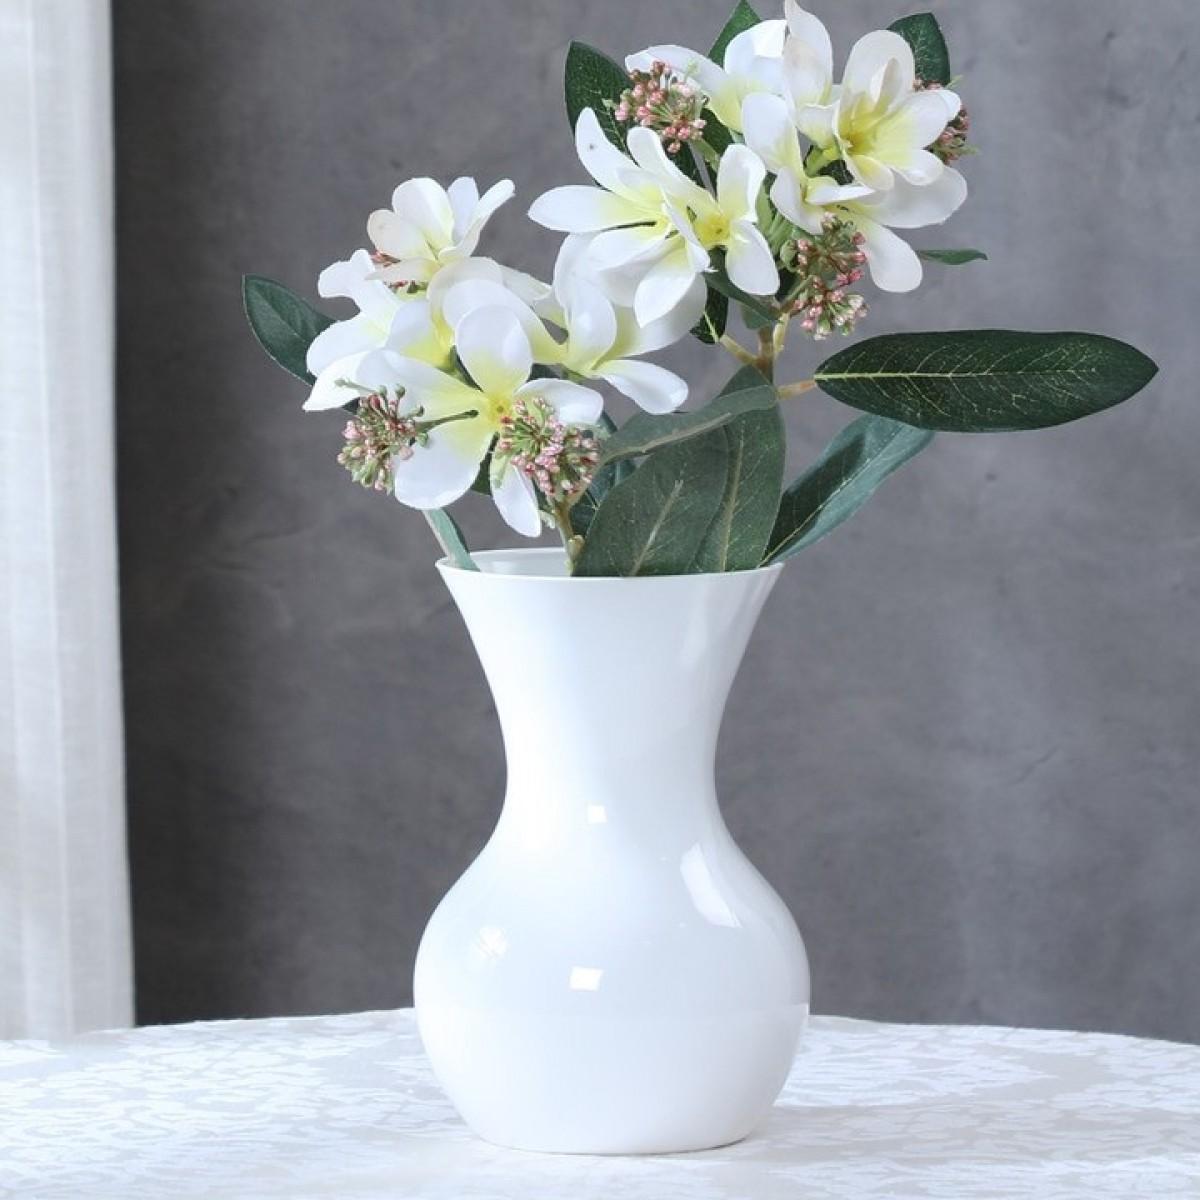 Sweetheart White 11x18cm Acrylic Vase - 1 No